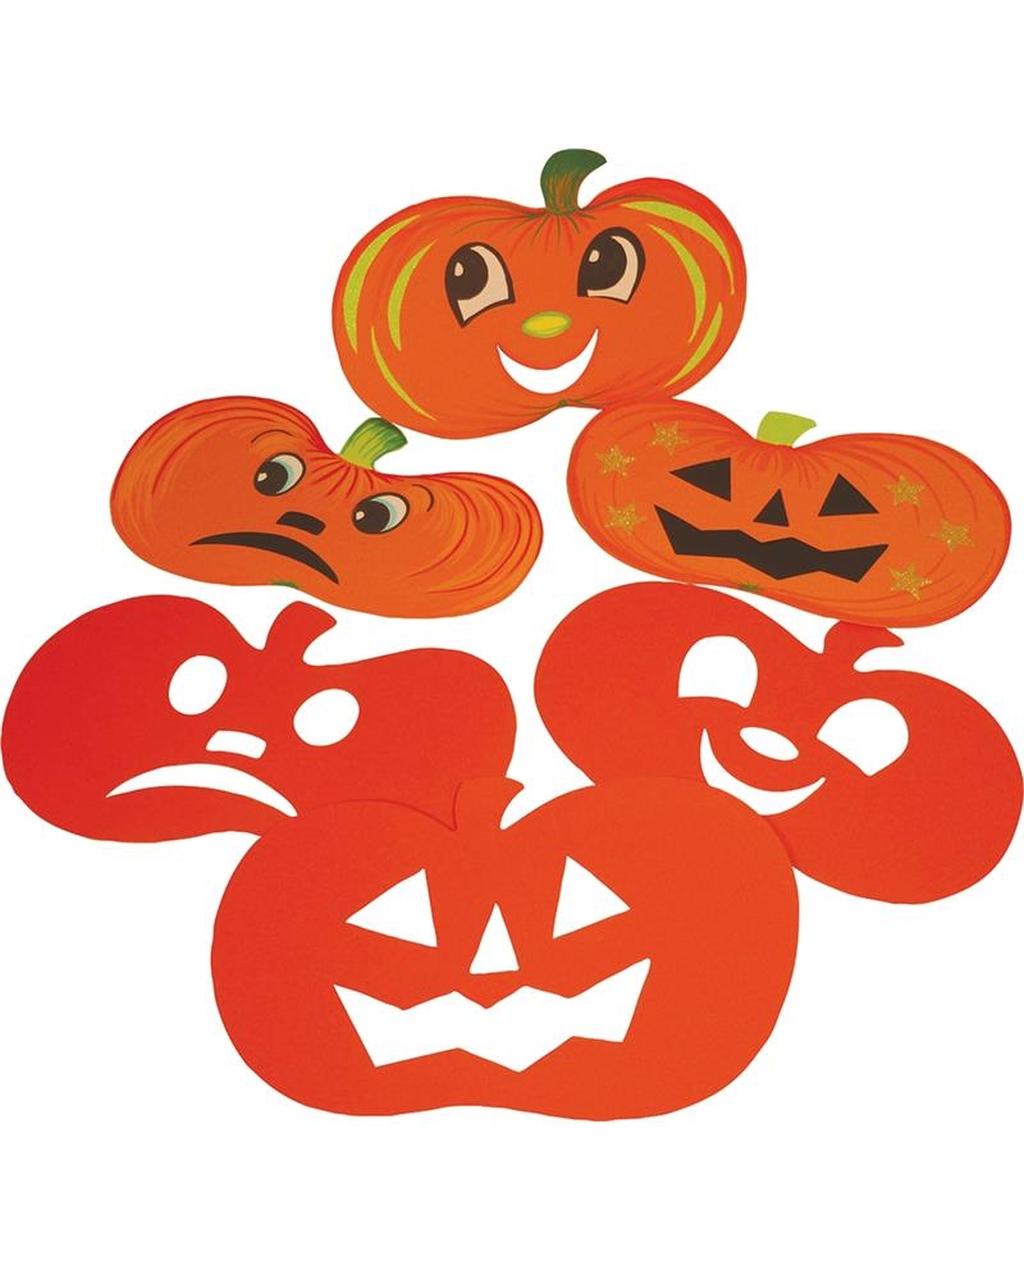 Pumpkin Cut Out Display Shapes